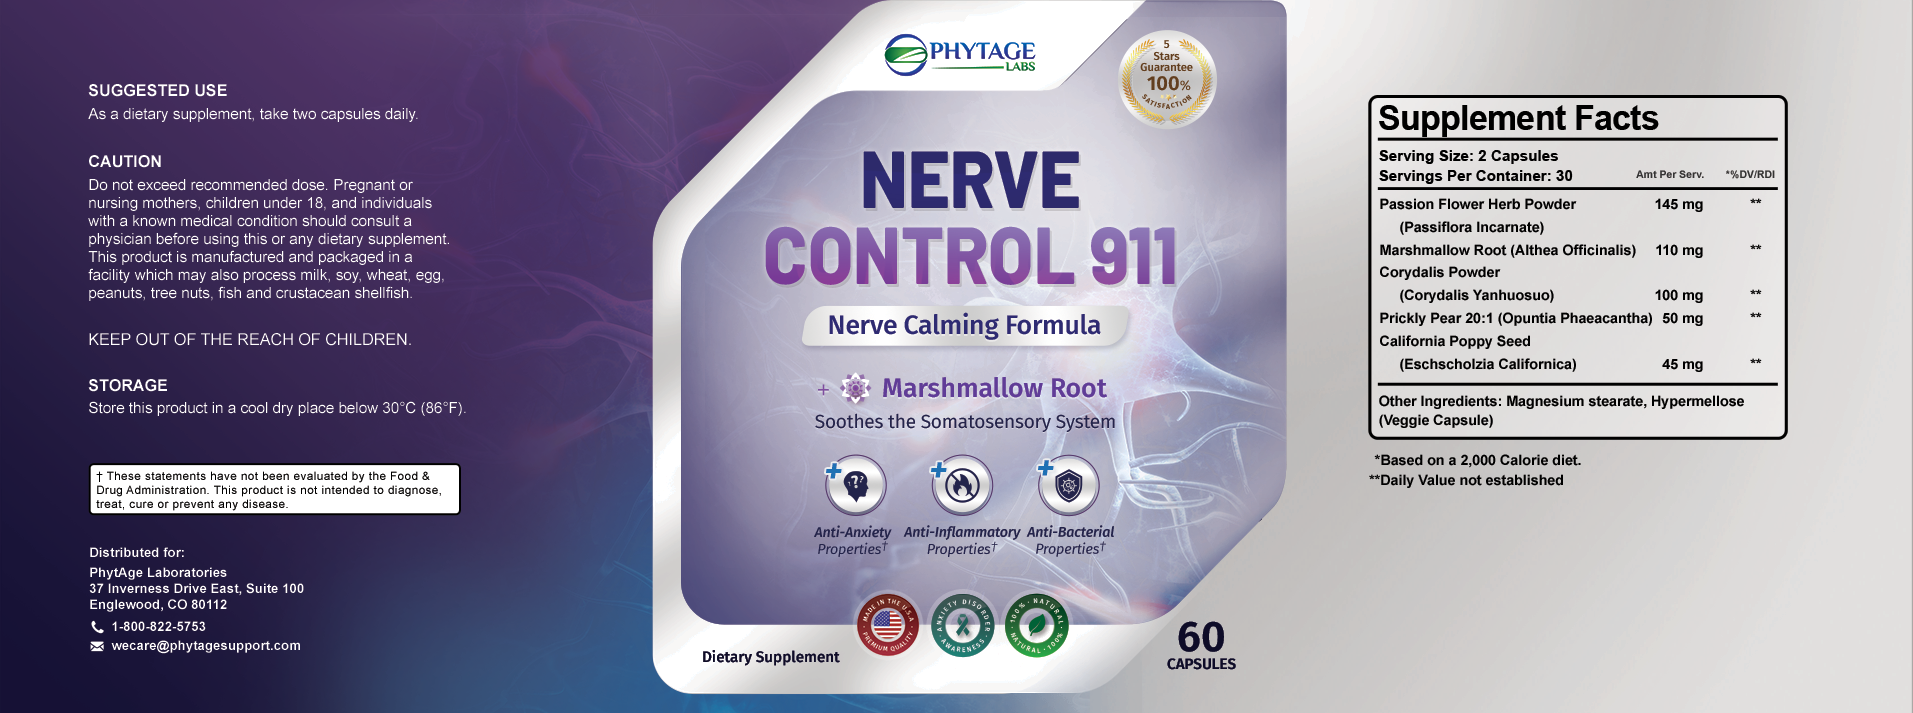 Phytage Nerve Control 911 Ingredients